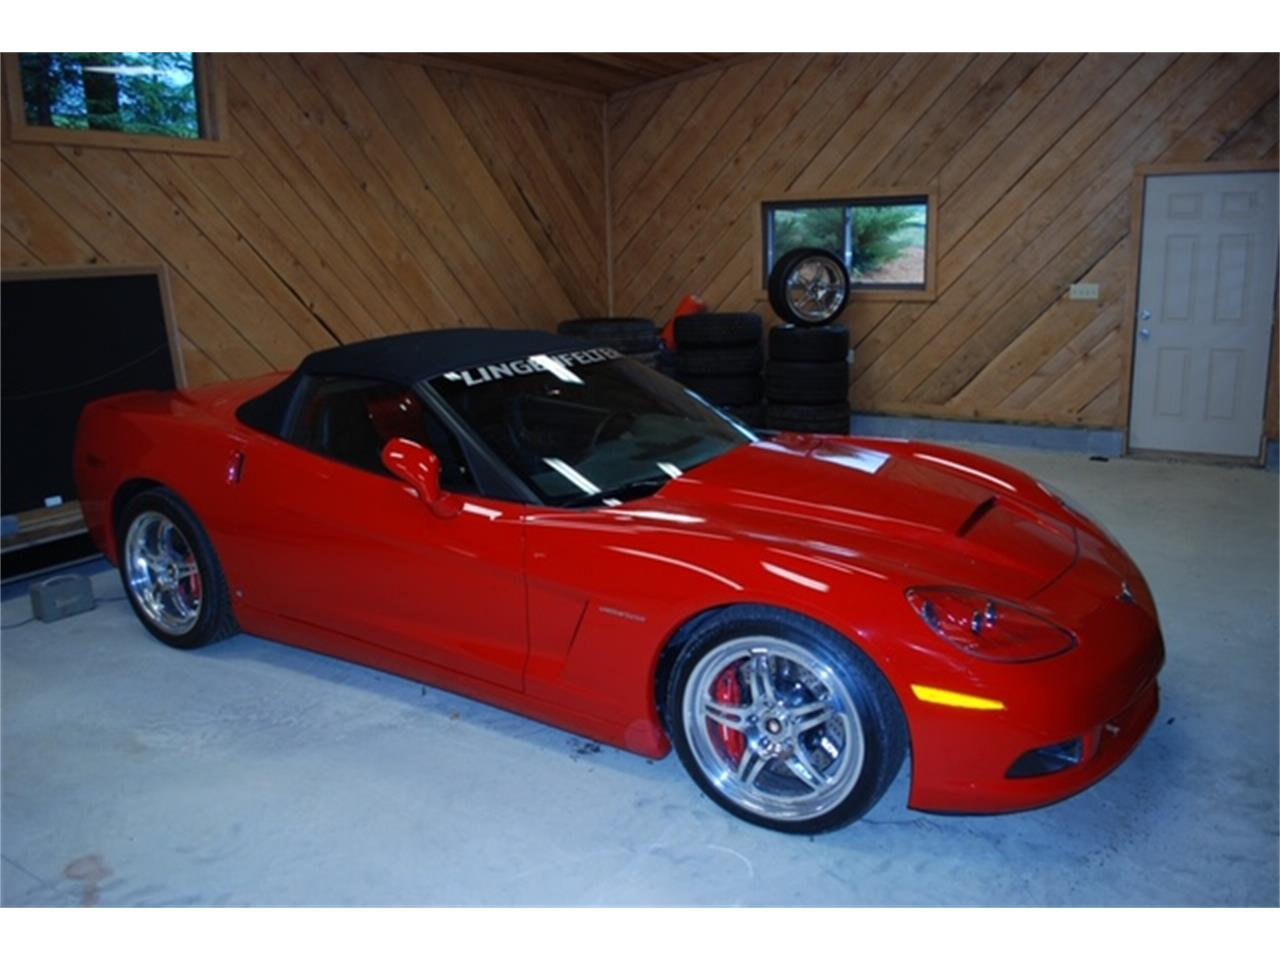 2006 Chevrolet Corvette (CC-1335546) for sale in Mount Lookout, West Virginia